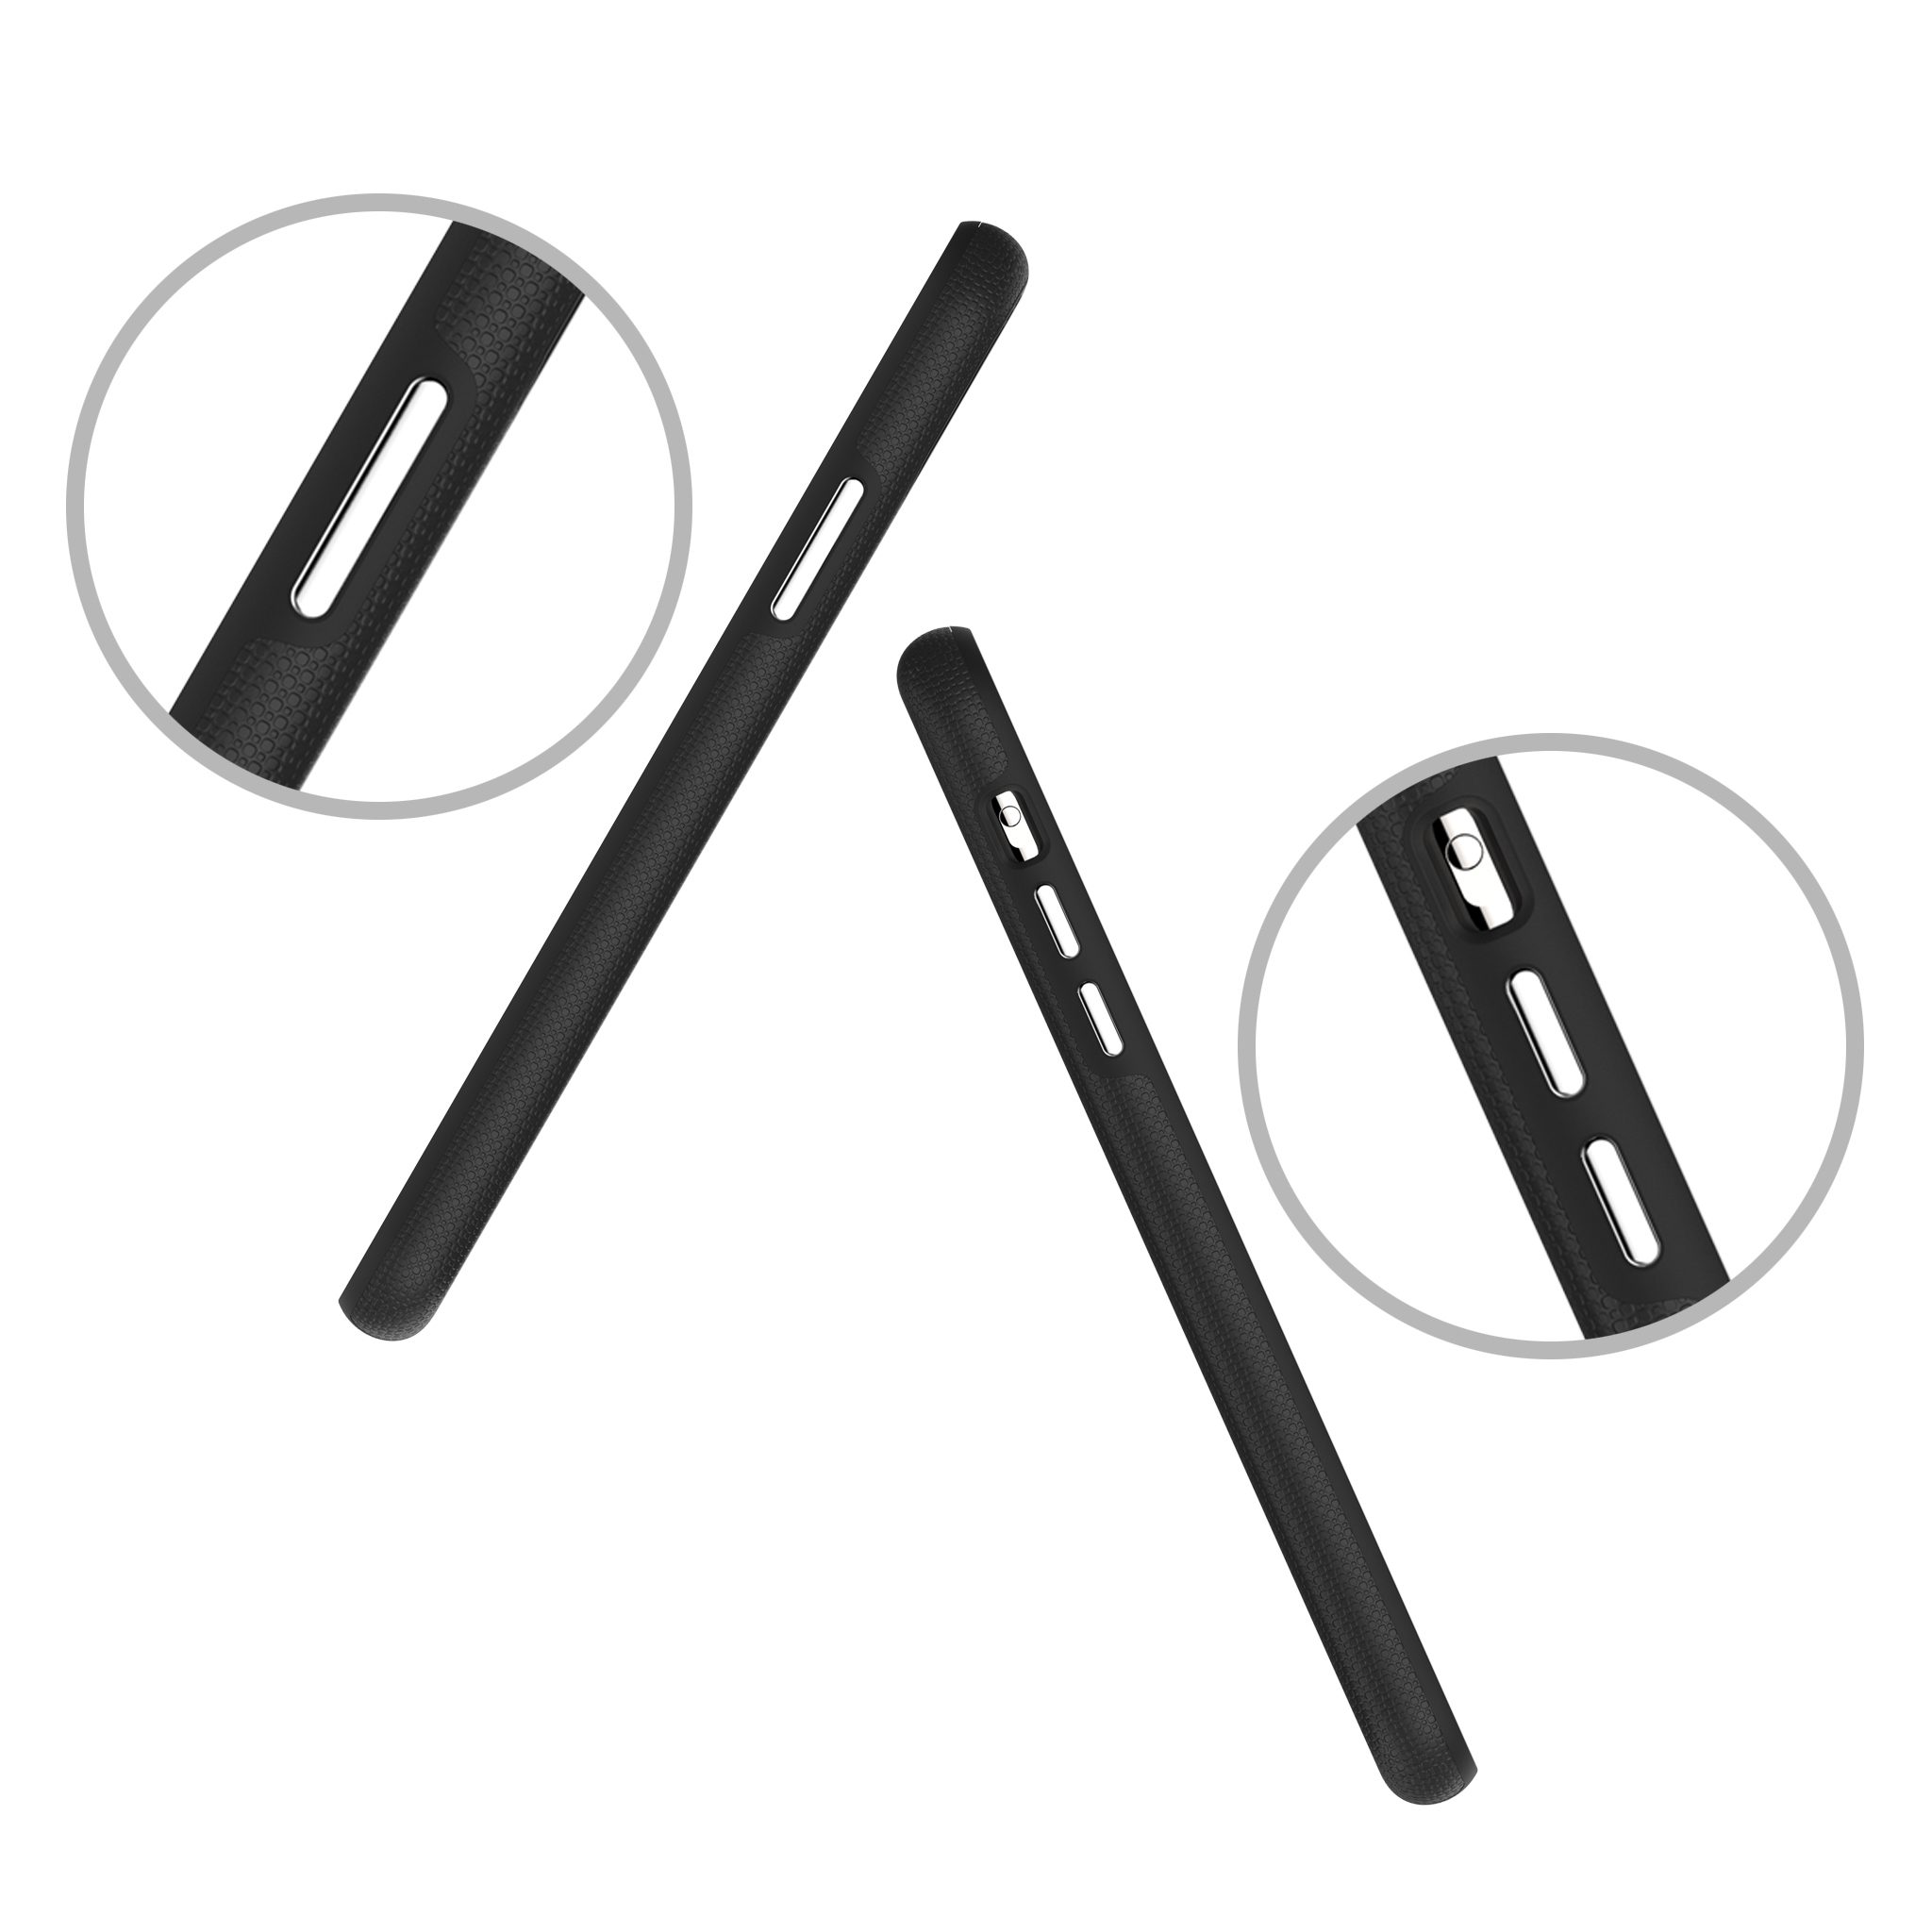 Iphone 11 Max Case Render Olixar Img 2